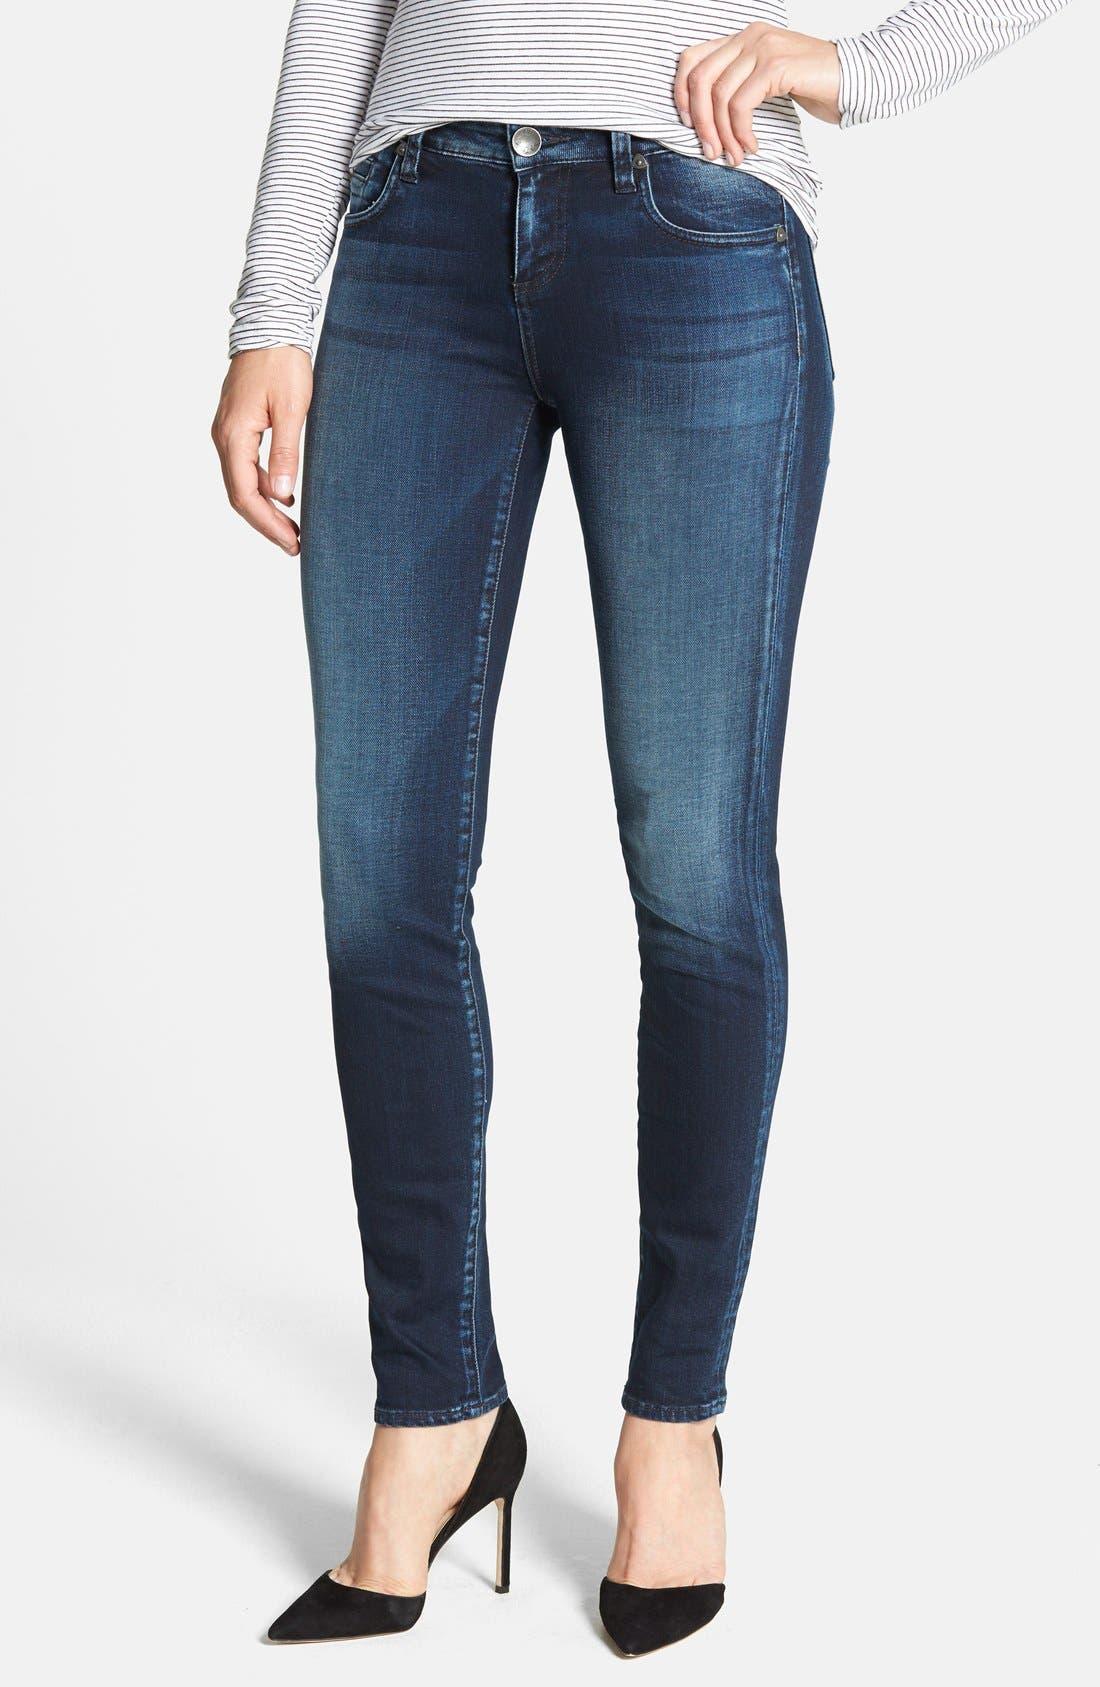 Main Image - KUT from the Kloth 'Diana' Skinny Jeans (Breezy)